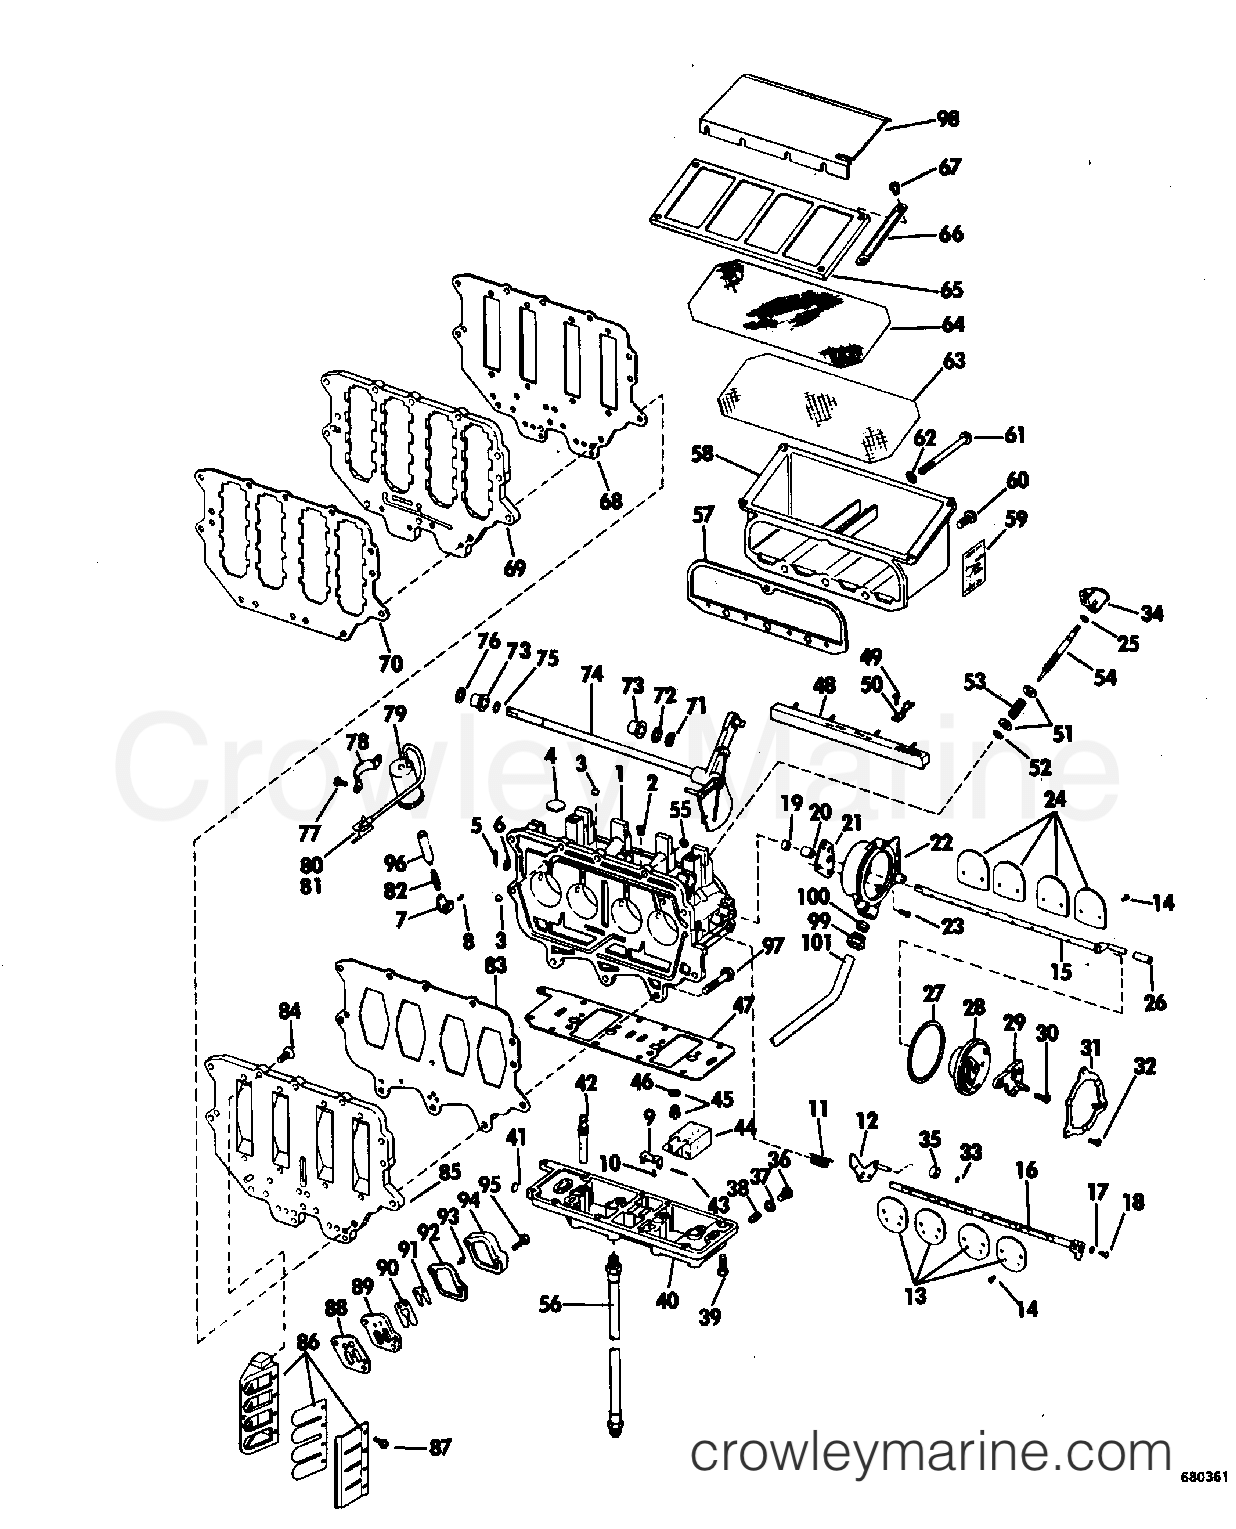 1968 OMC Stern Drive 90 - DU-15S - CARBURETOR GROUP section